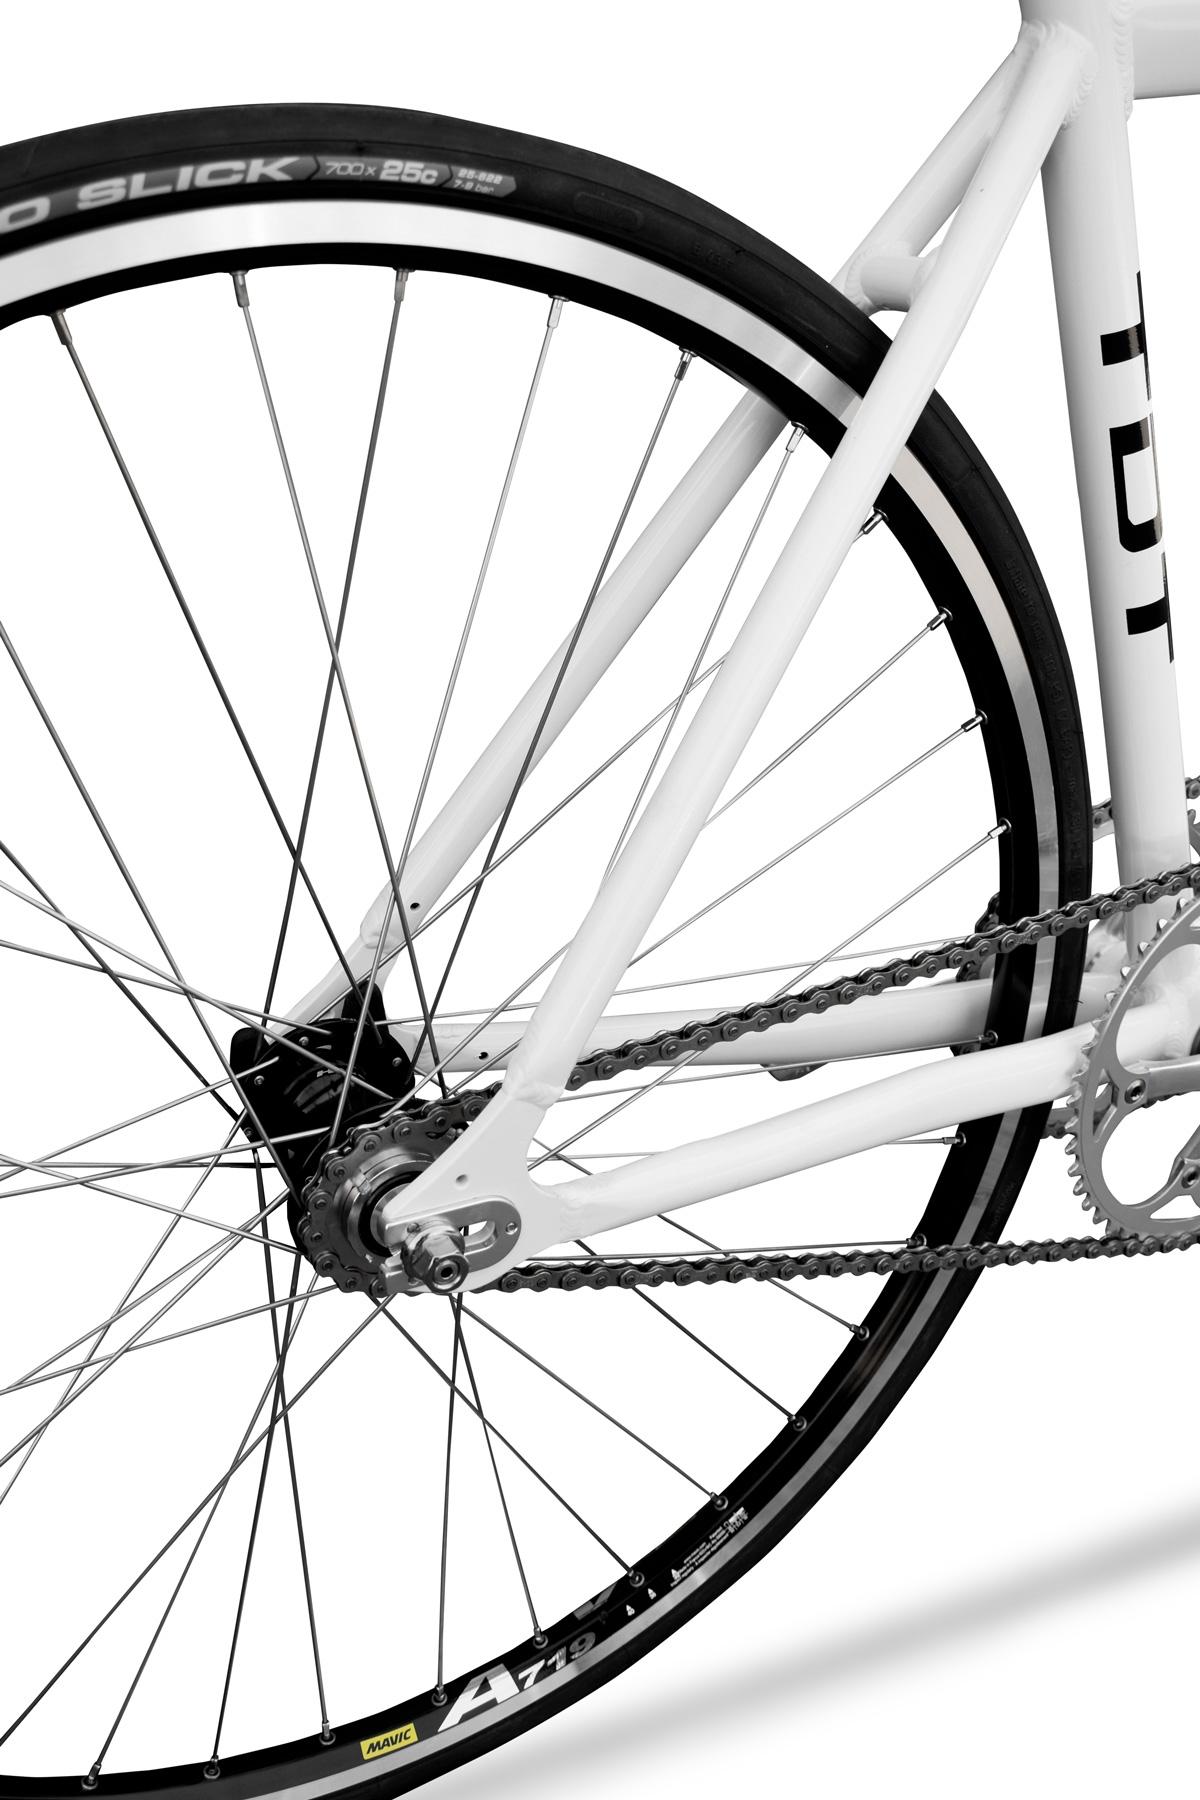 1200x1800 Dolan Tdt Tandem Track Bike